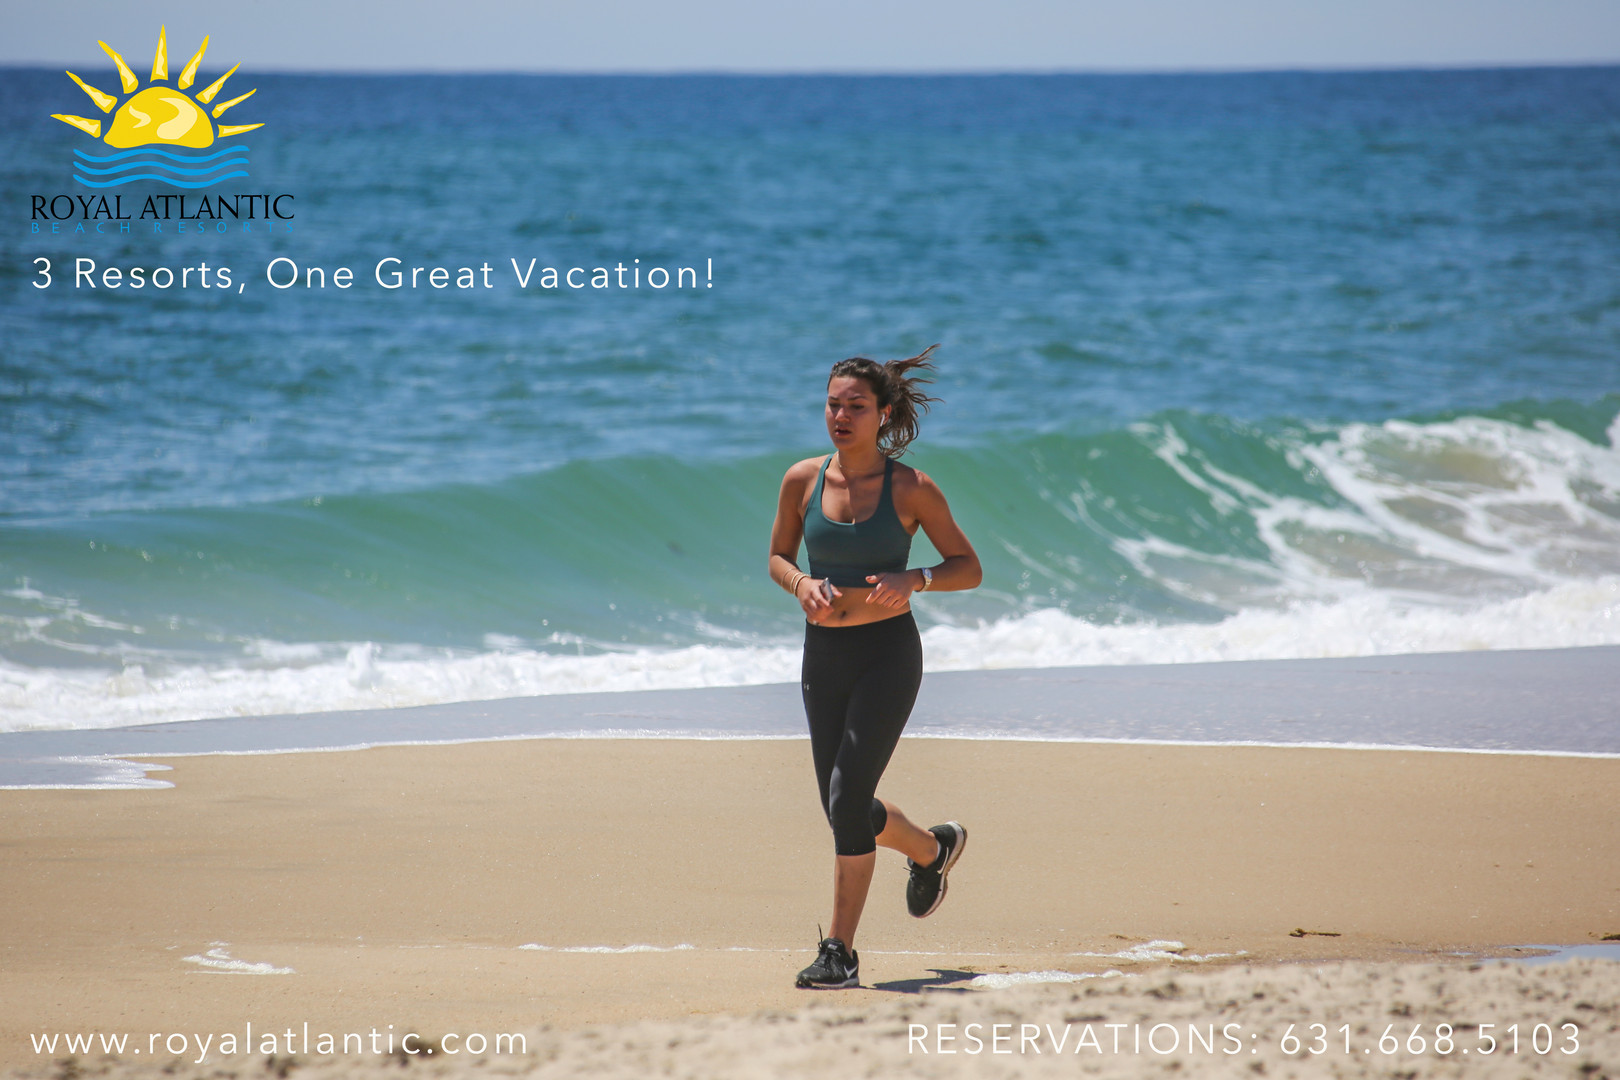 Lady Jogging-Beach-05122020.jpg